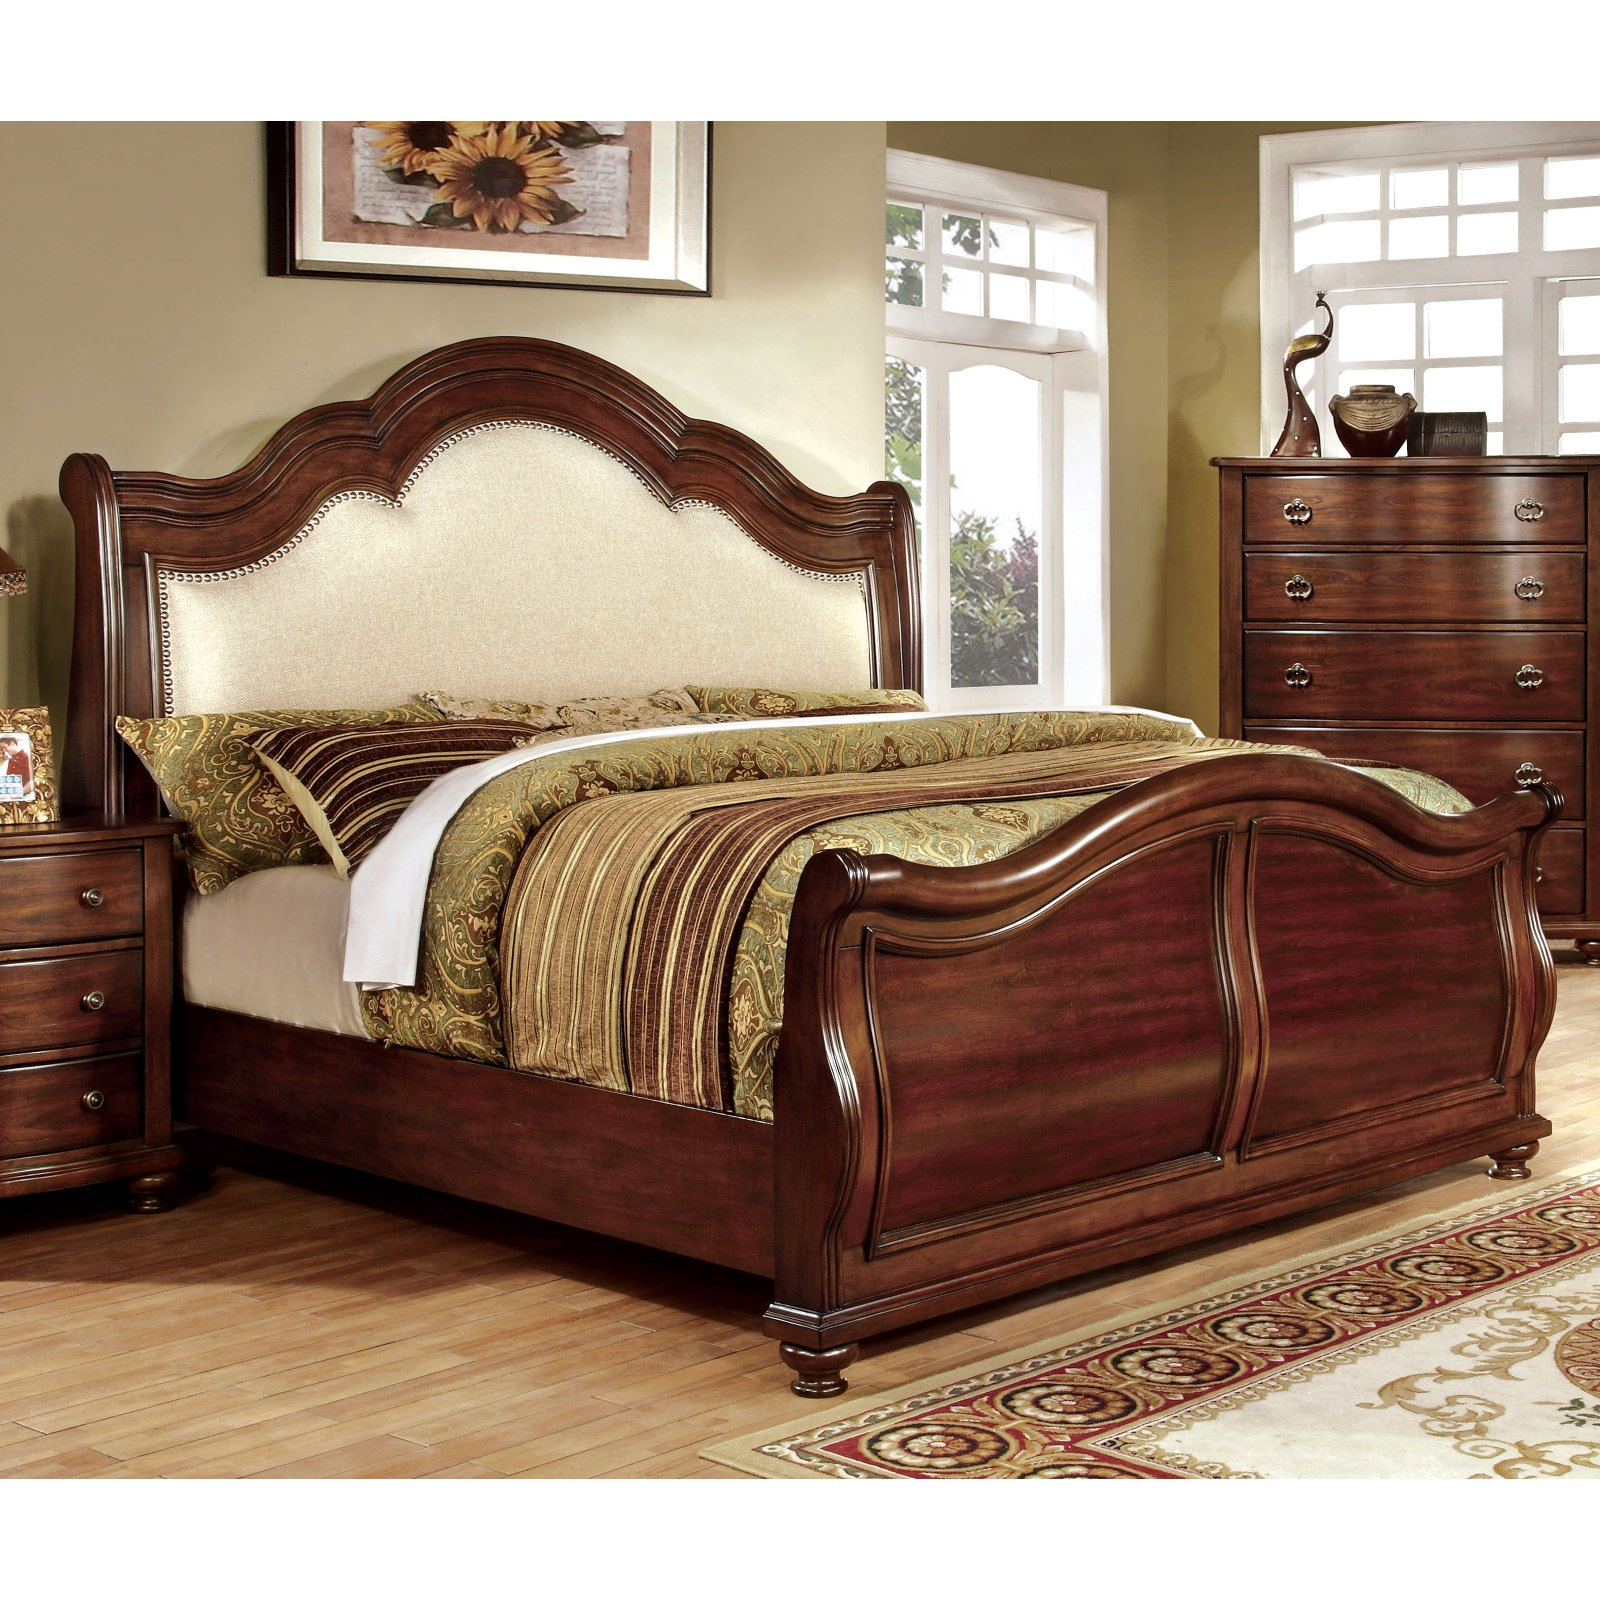 Furniture of America Meveena Sleigh Bed